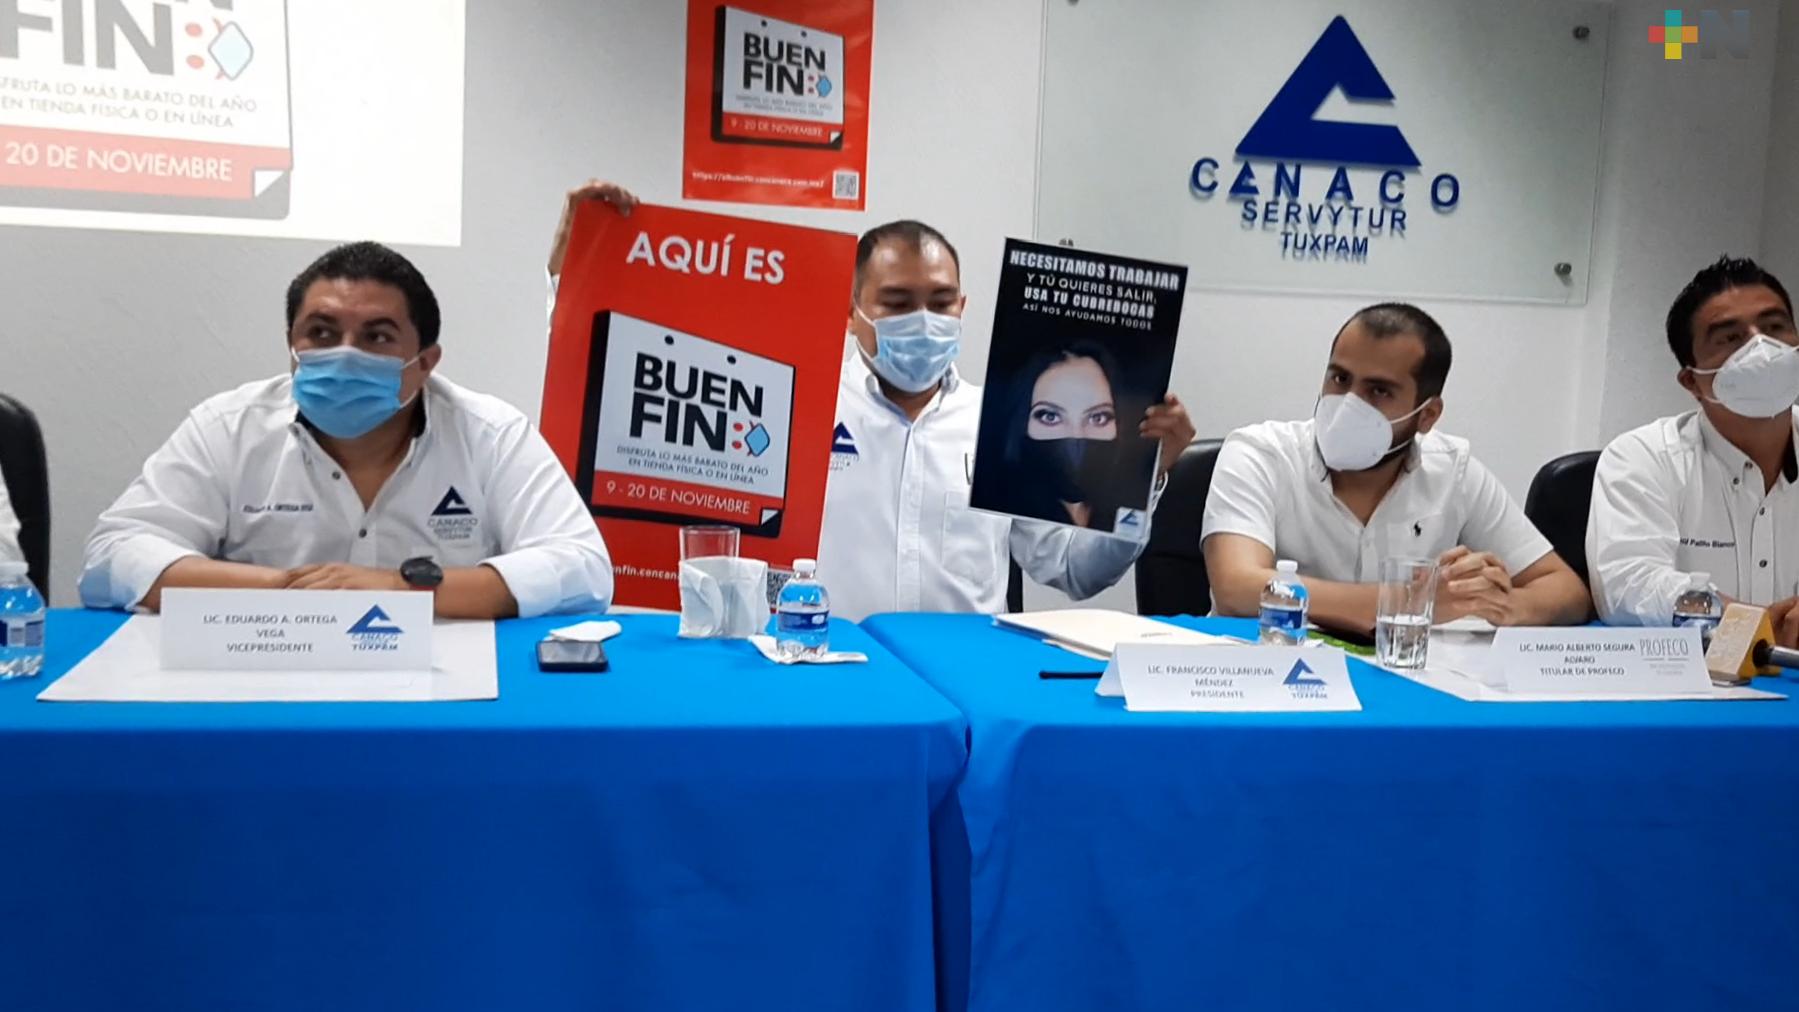 CANACO continúa promoviendo uso de cubrebocas en Tuxpan